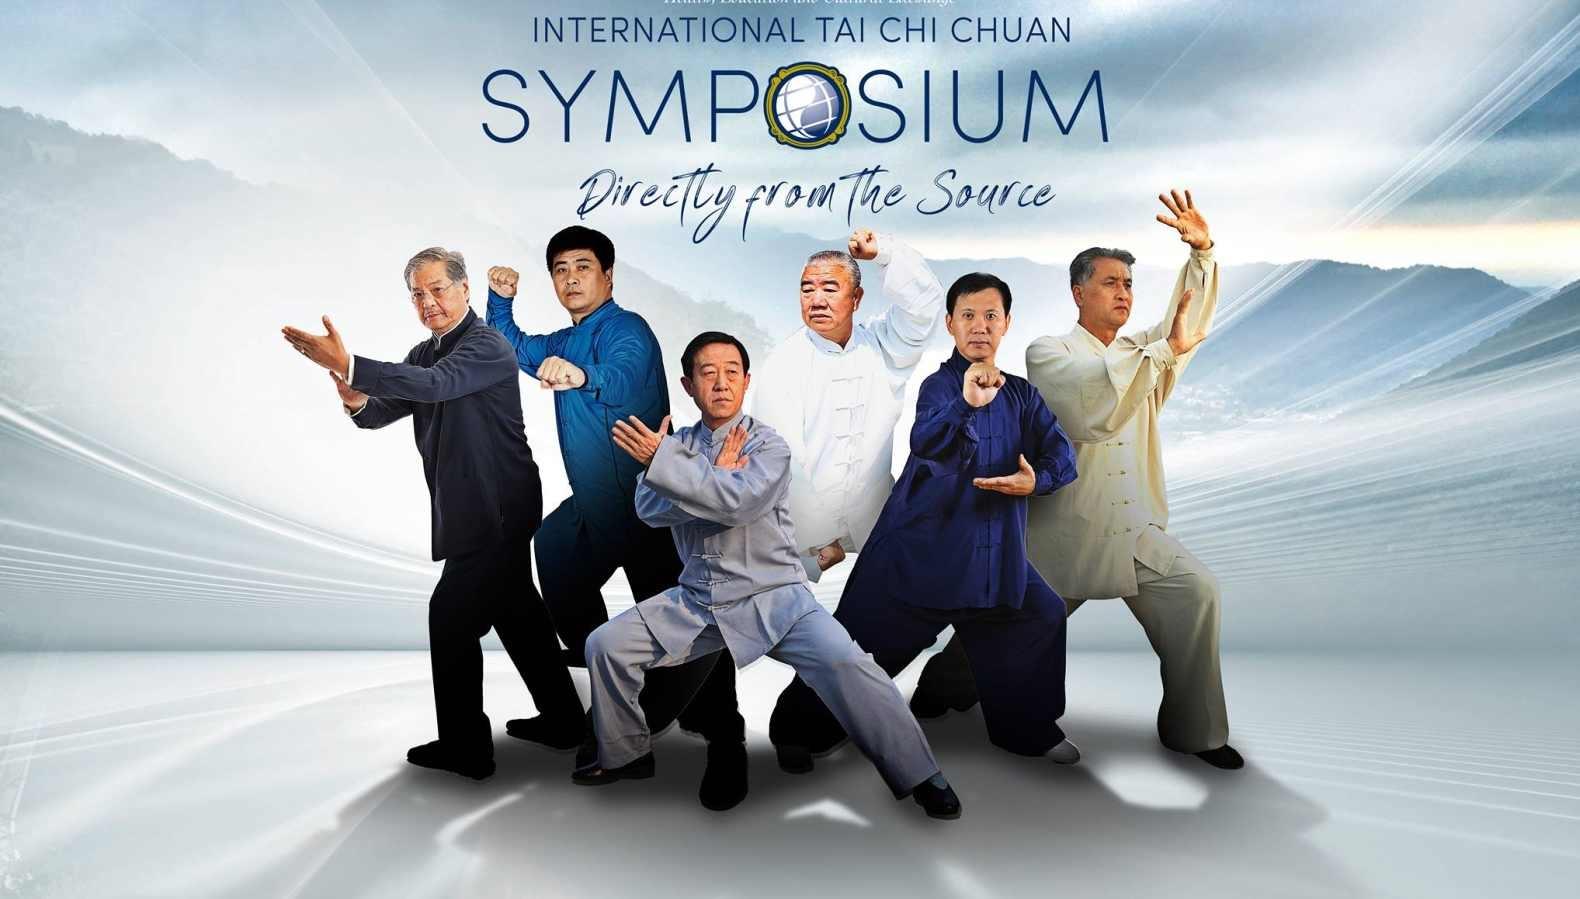 Symposium internazionale di Tai Chi Chuan